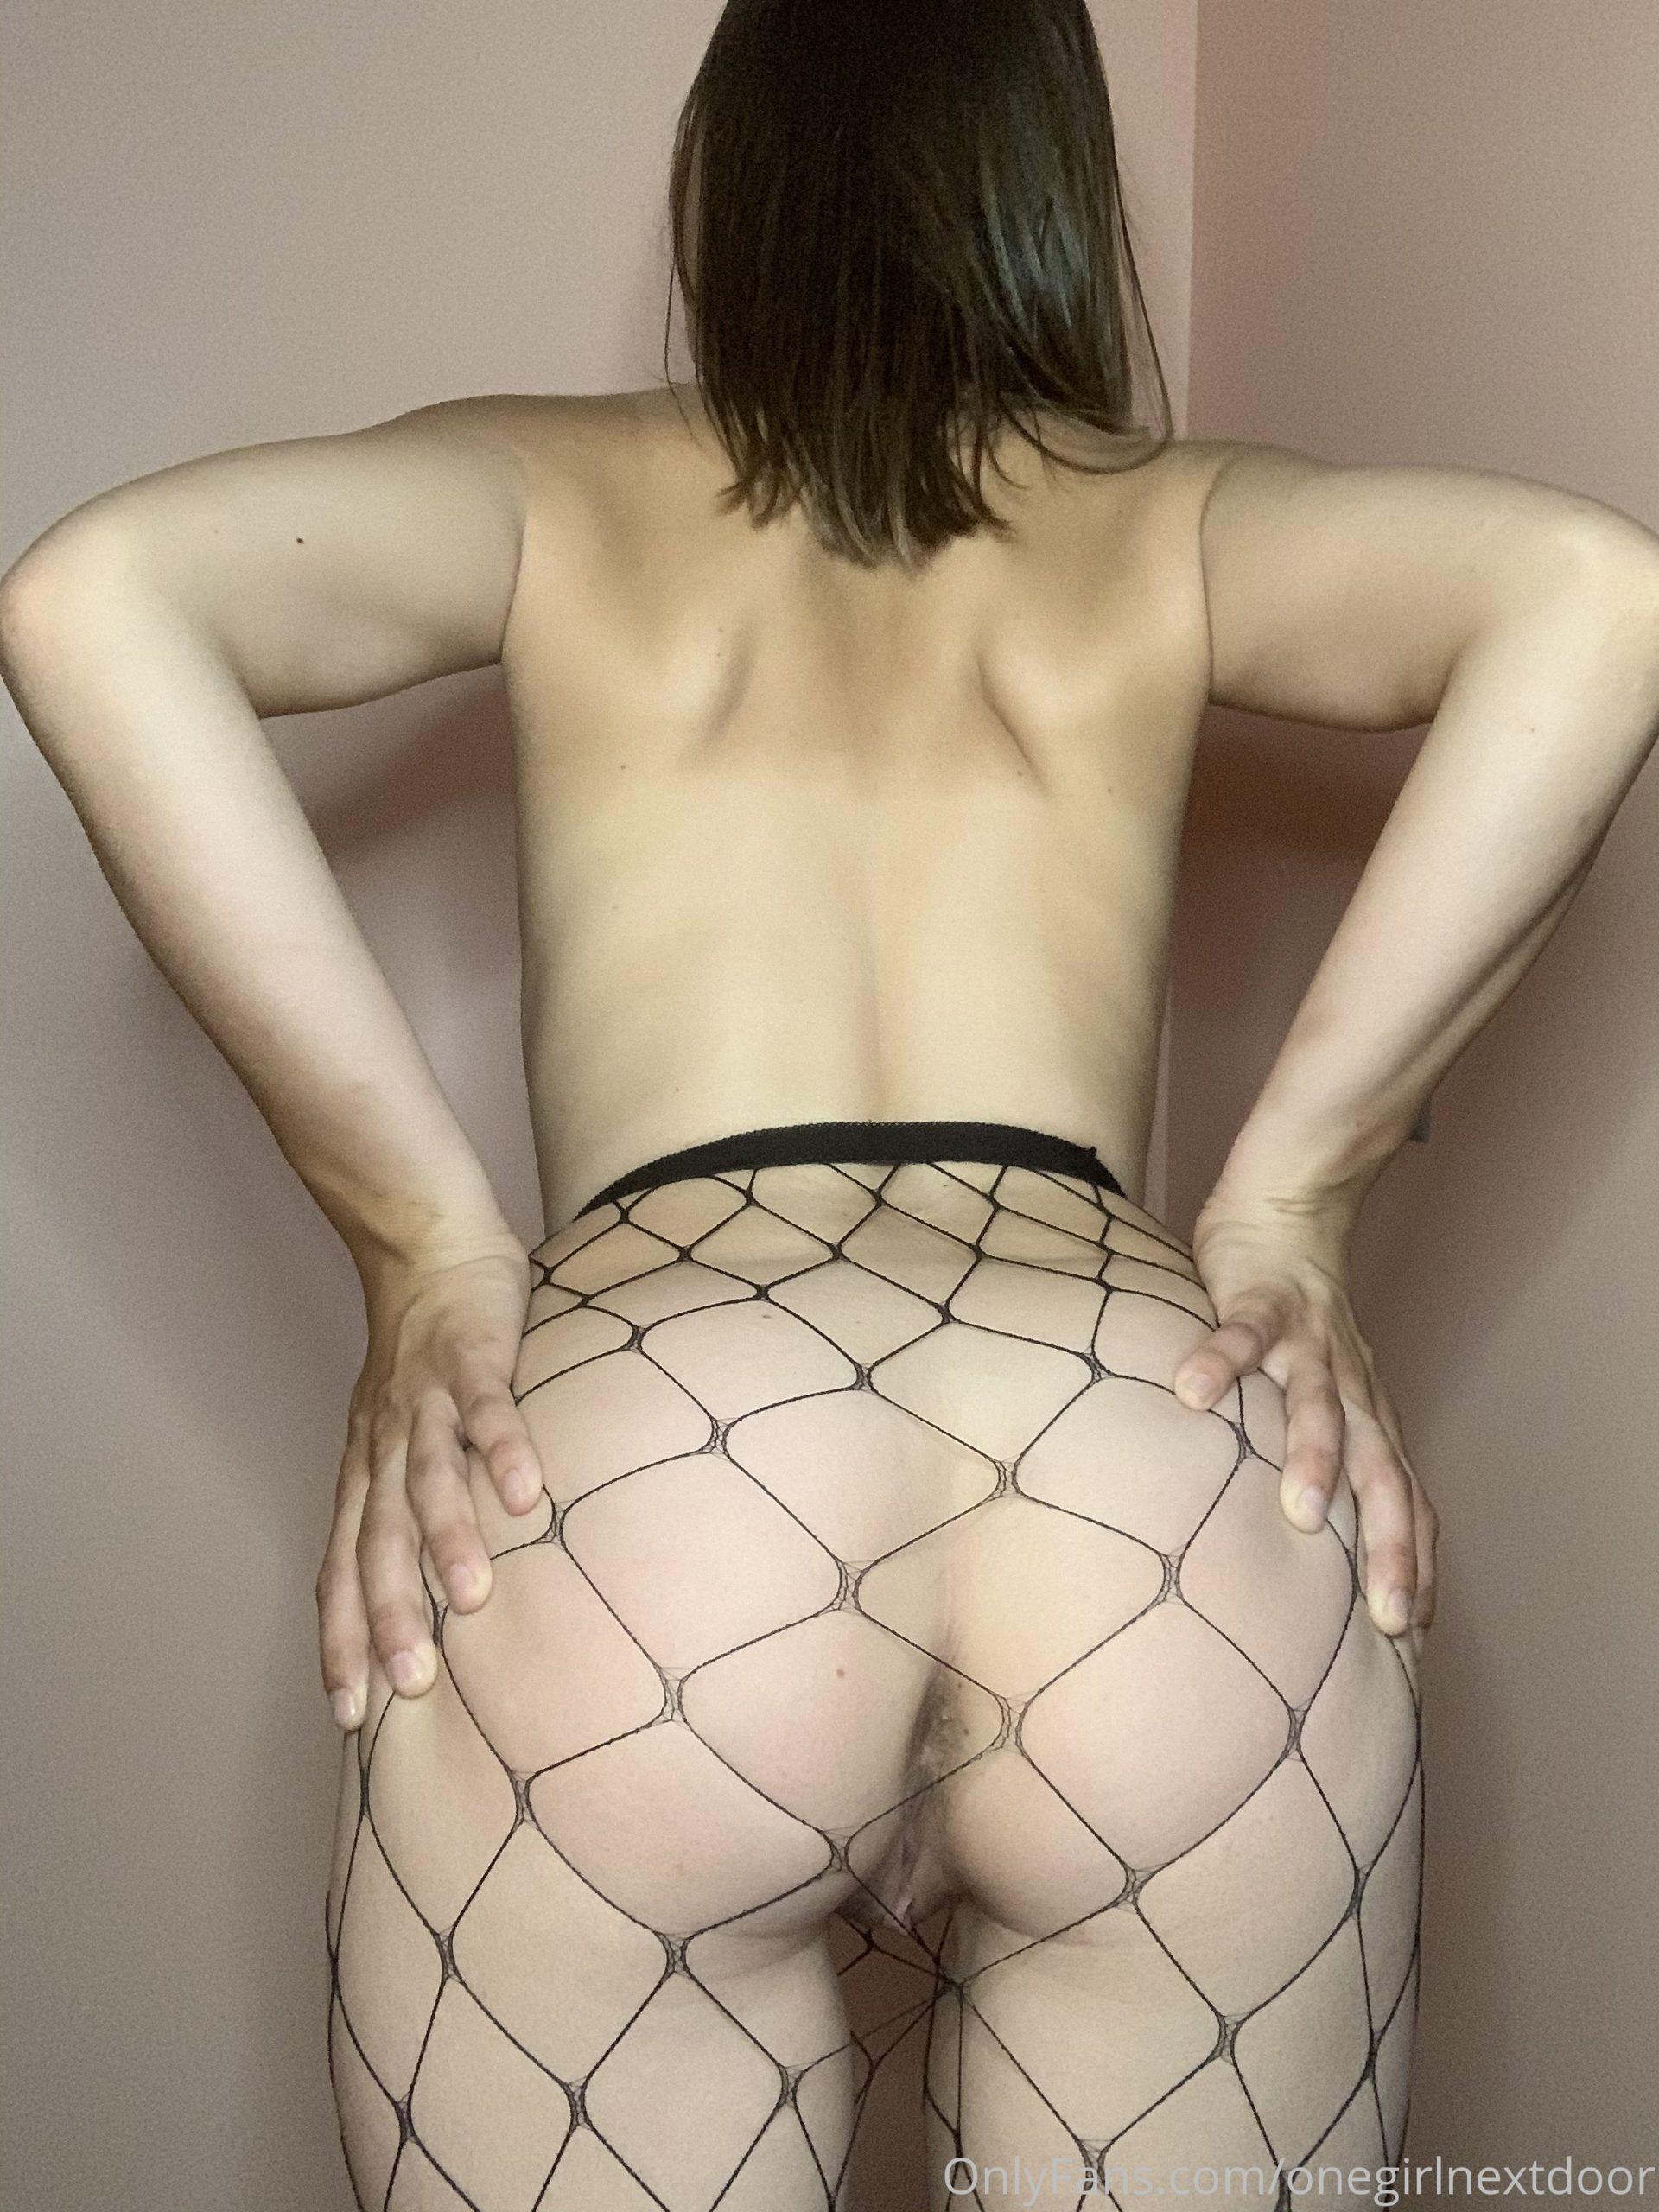 FULL VIDEO: Ashley Tervort Nude Onlyfabs Leaked!